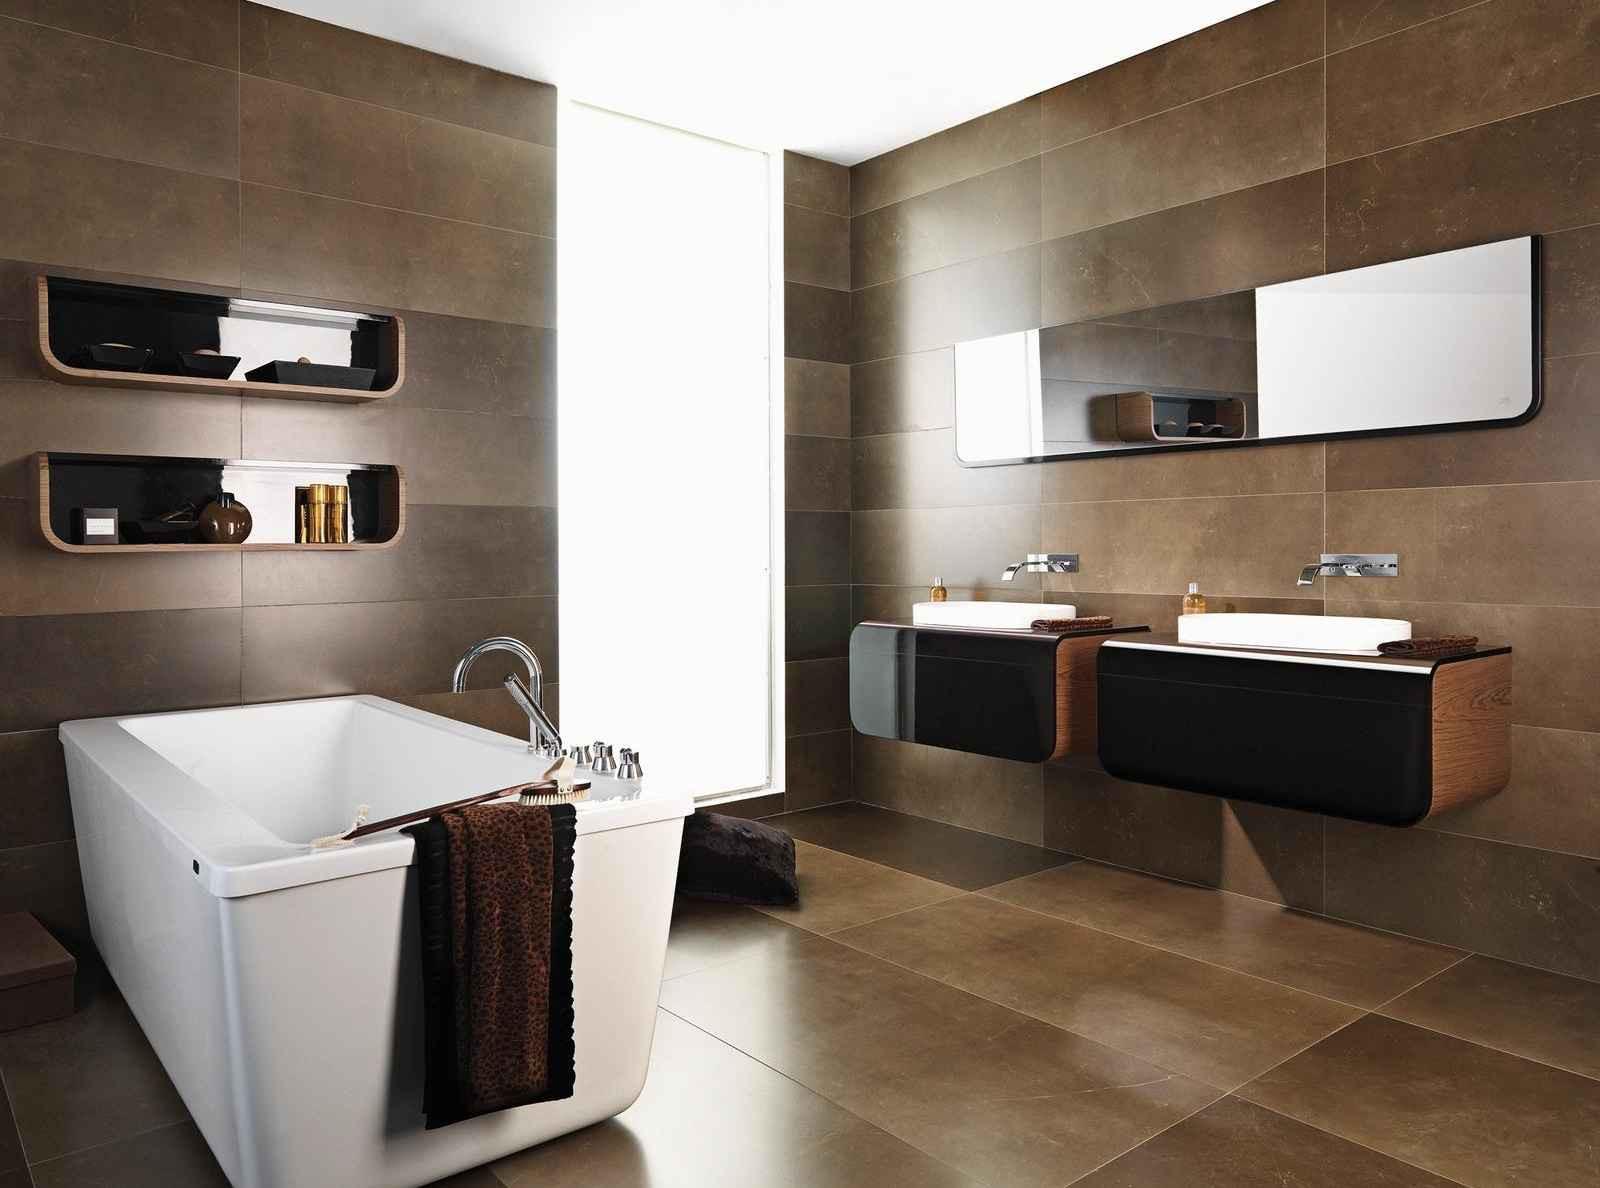 Bathroom Ceramic Floor Tile Ideas  27 wonderful pictures and ideas of italian bathroom wall